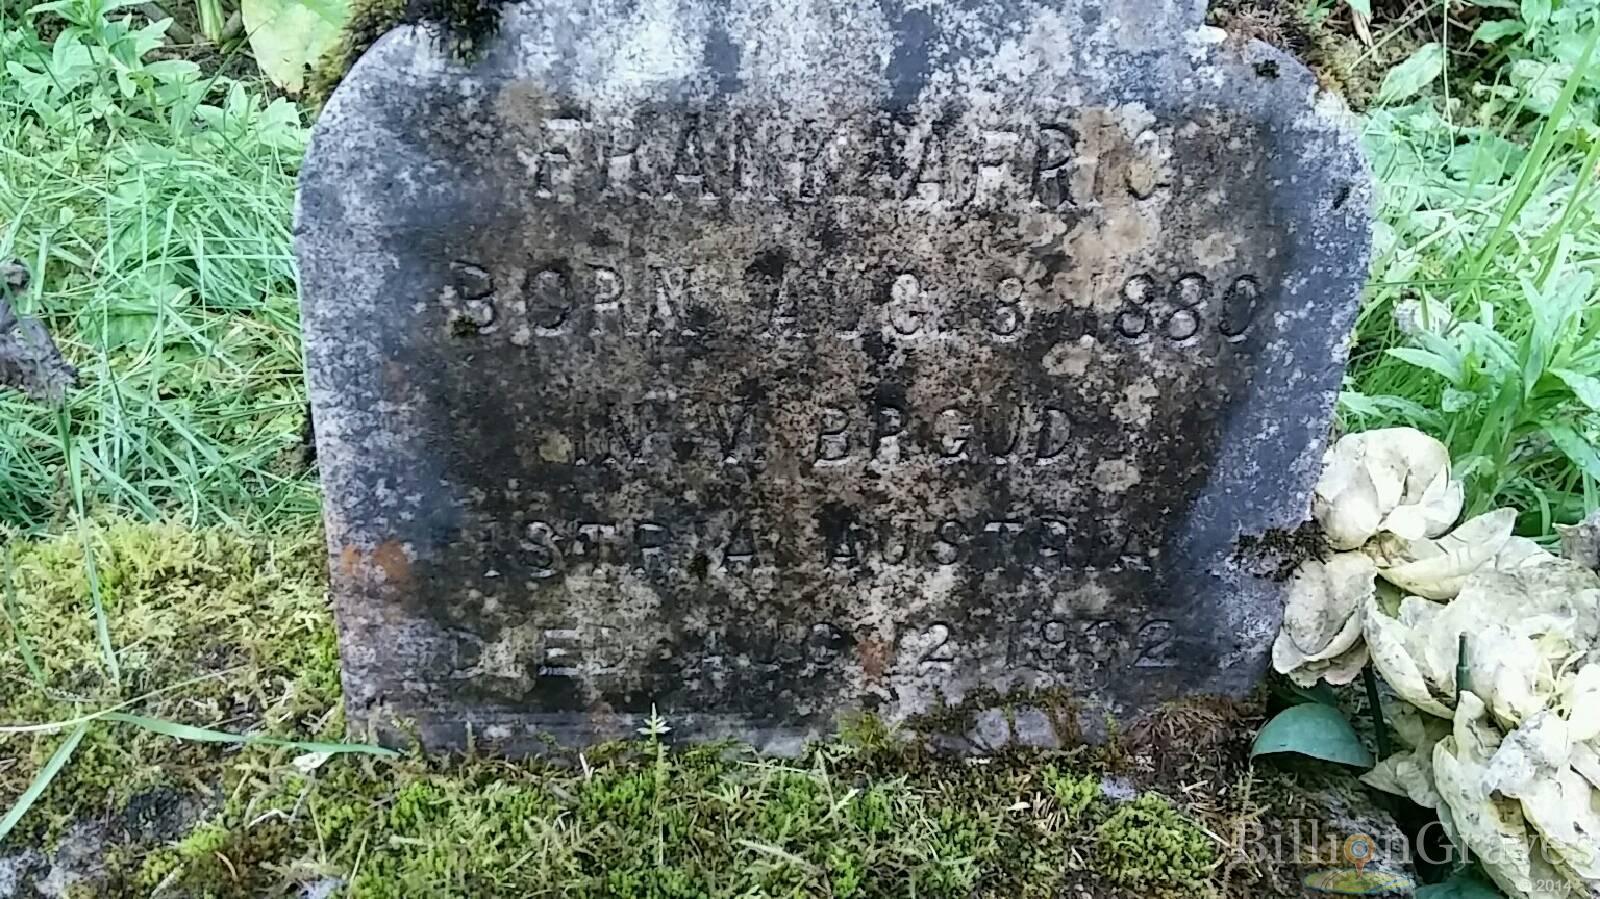 BillionGraves, gravestone, grave, damaged gravestones, cemetery, family history, ancestors, community service project, JustServe, BillionGraves app, ivy, plant growth, JustServe, moldy grave, plants